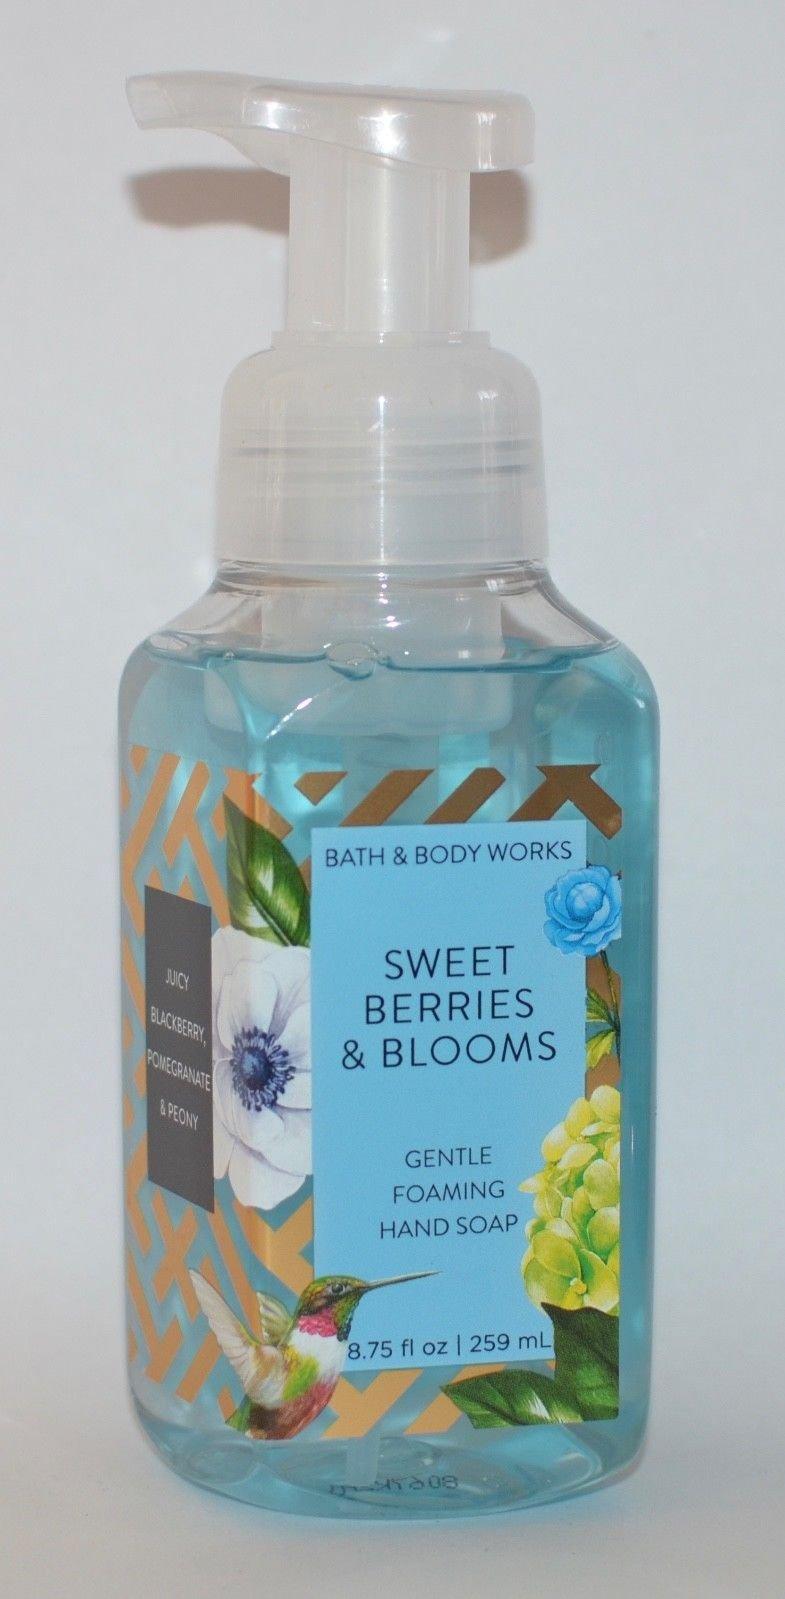 Bath & Body Works Bath Body Works Gentle Foaming Hand Soap Sweet Berries & Blooms